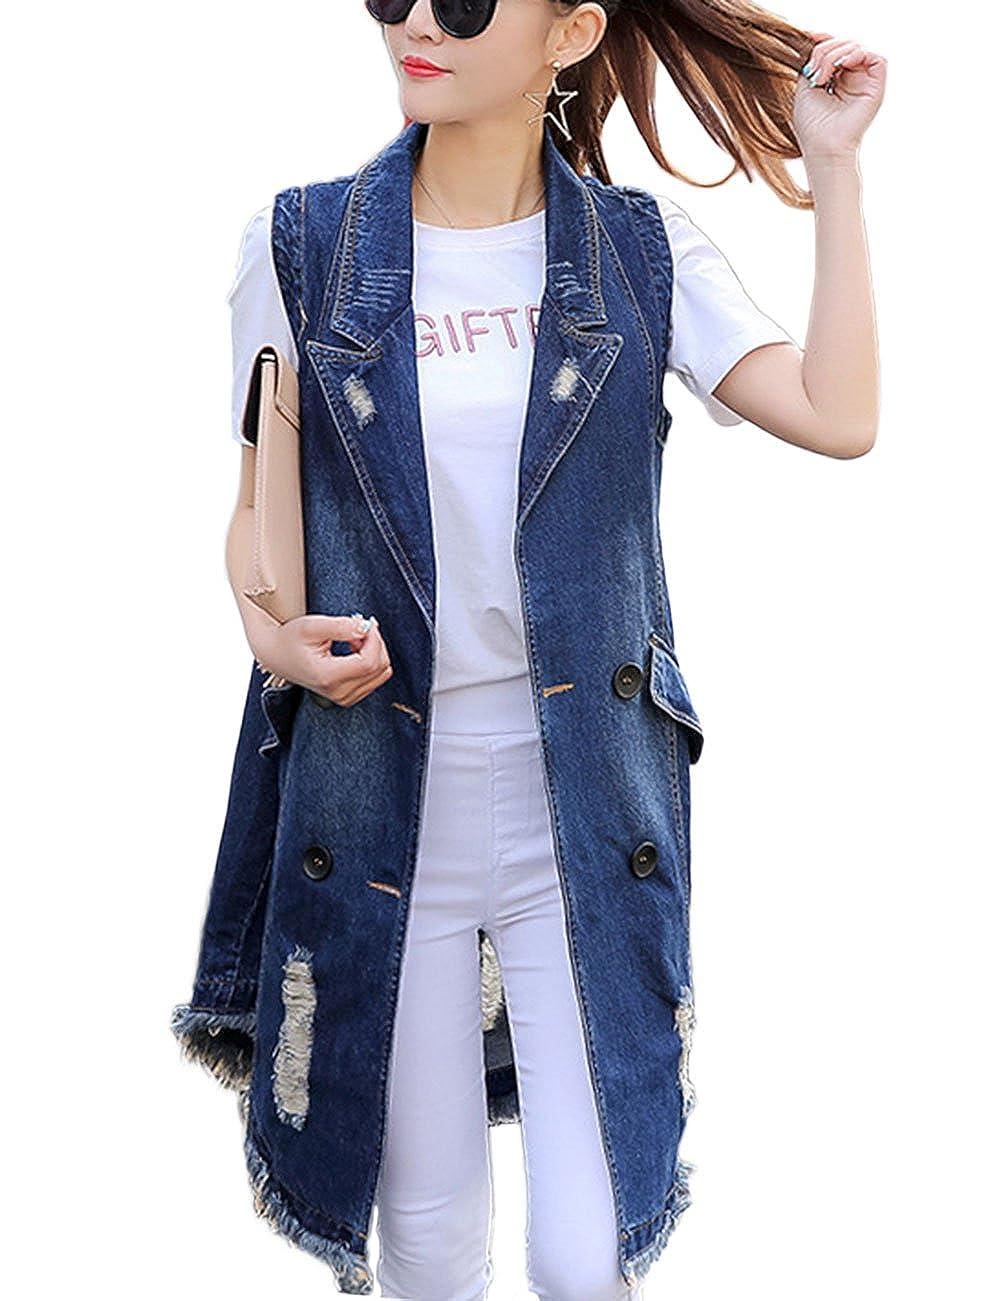 ZLSLZ Womens Girls Ripped Holes Long Length Sleeveless Denim Vest Jacket Plus Size Blue